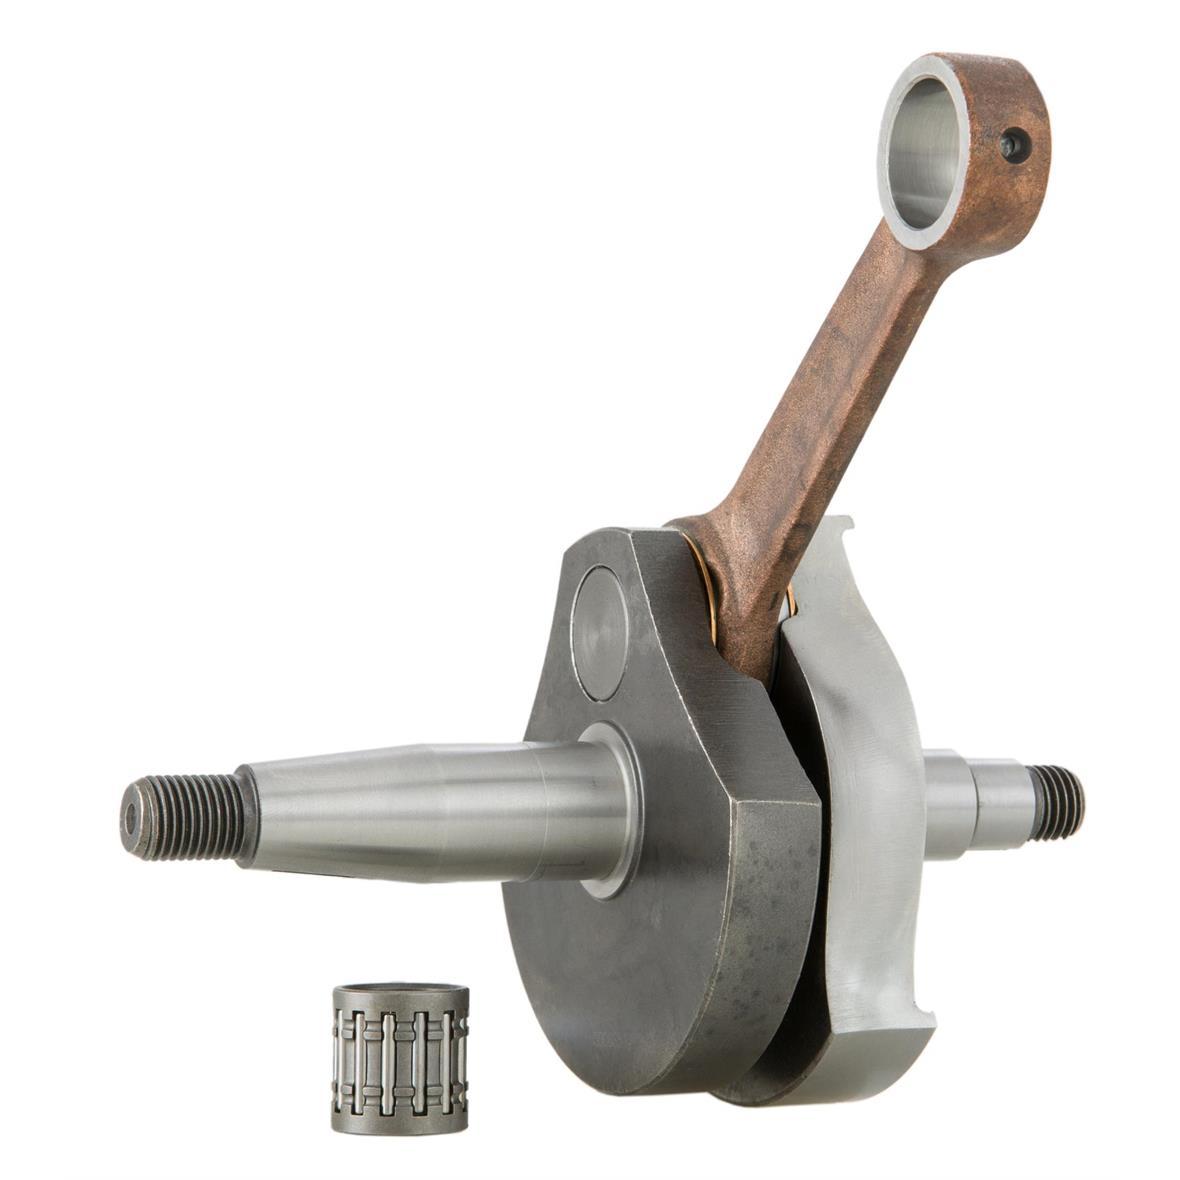 Product Image for 'Crankshaft JASILTitle'